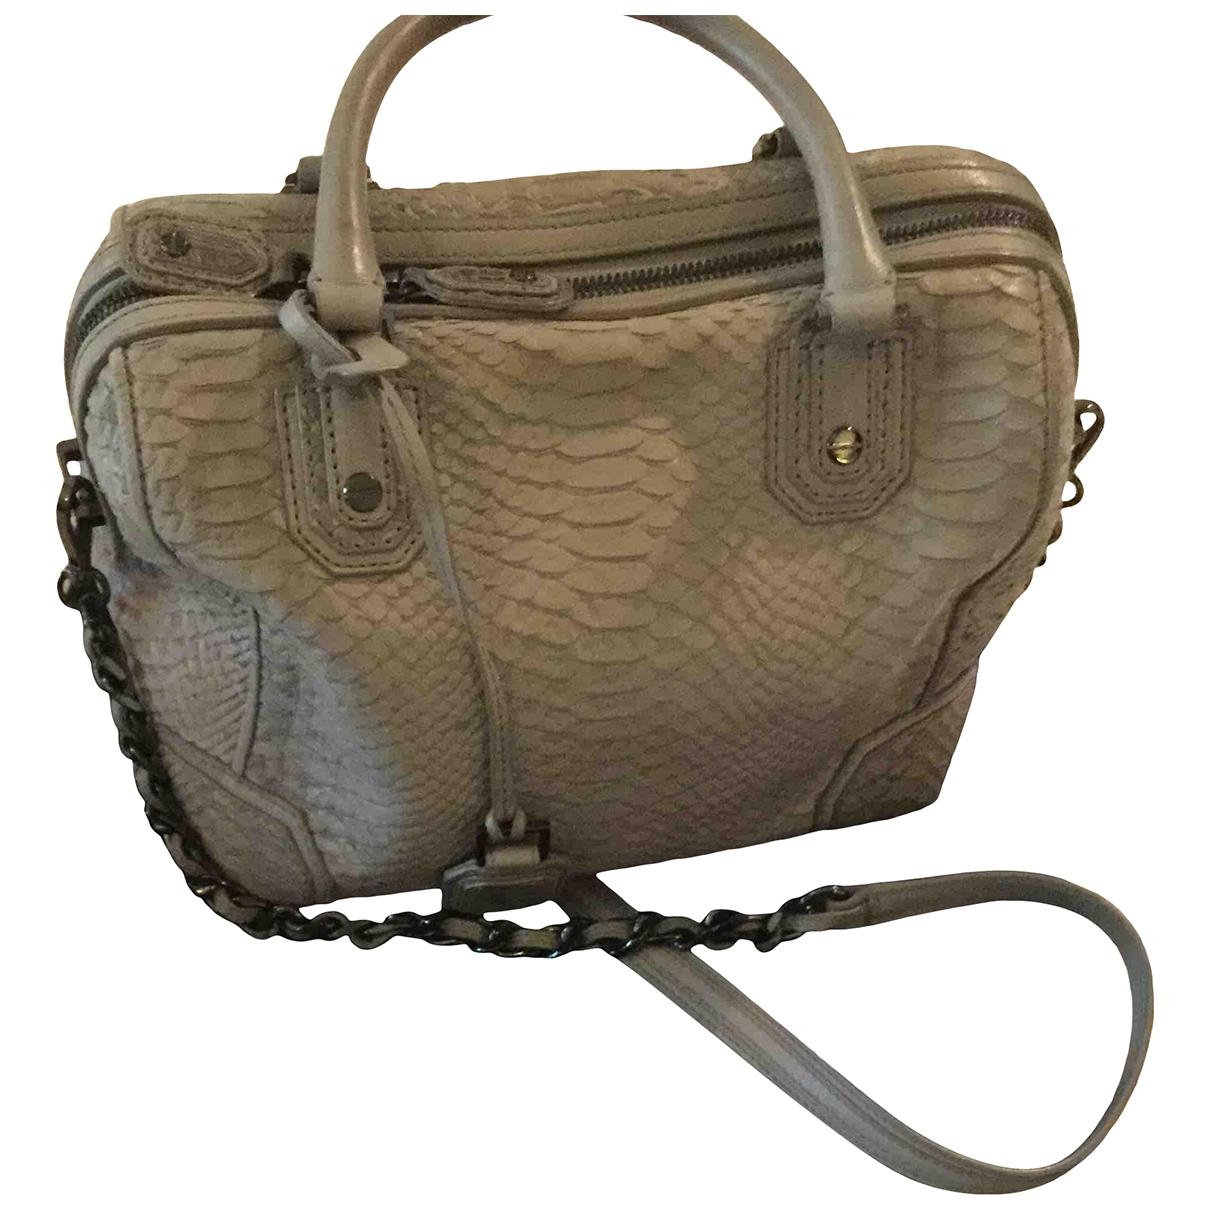 Alice & Olivia \N Grey Leather handbag for Women \N